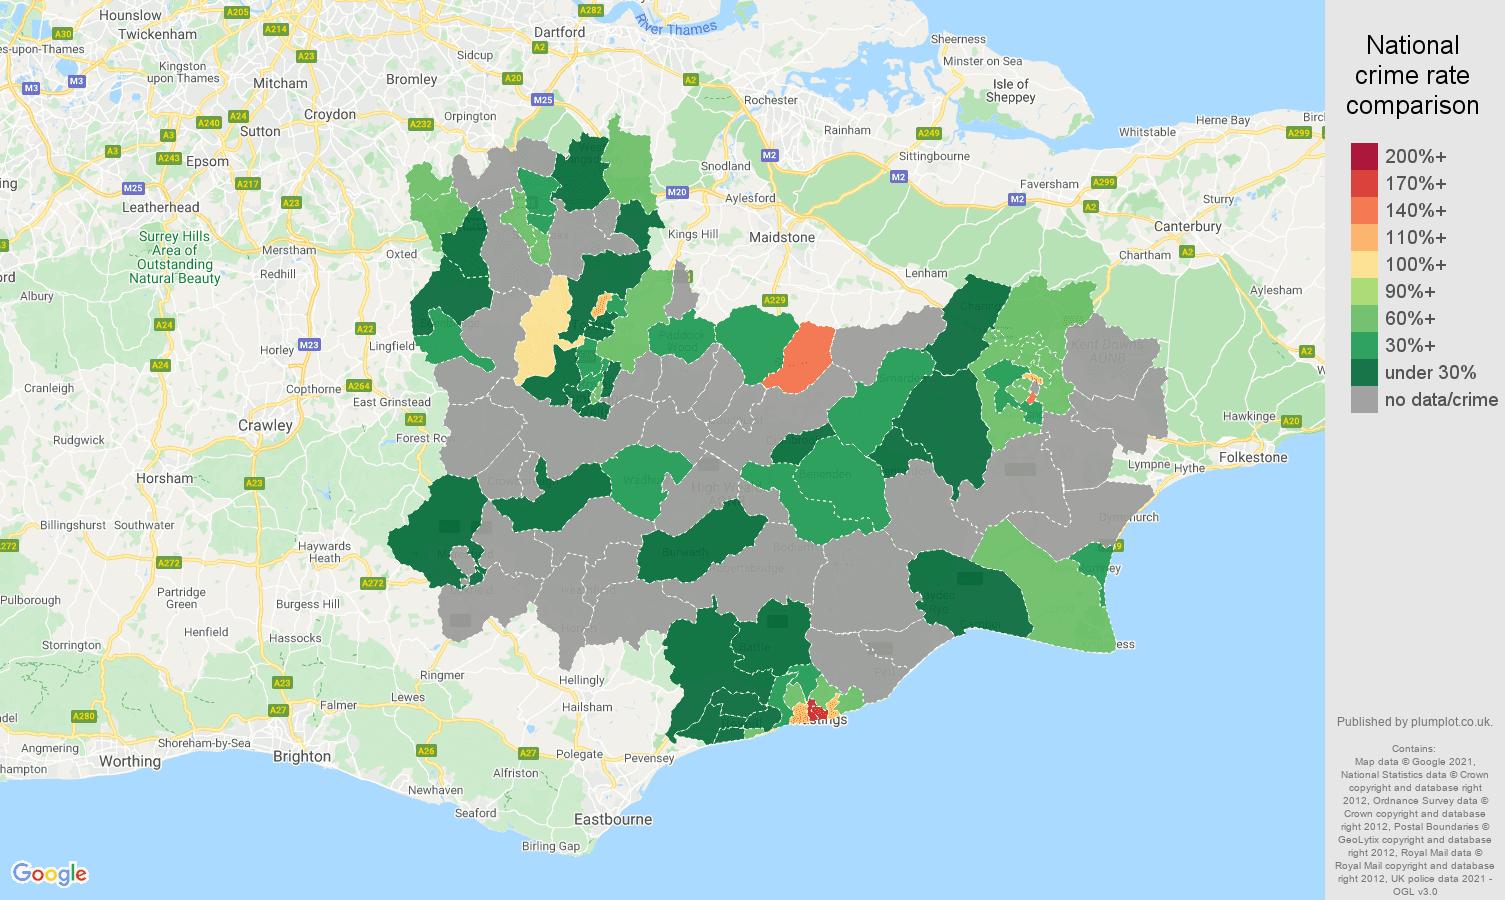 Tonbridge robbery crime rate comparison map